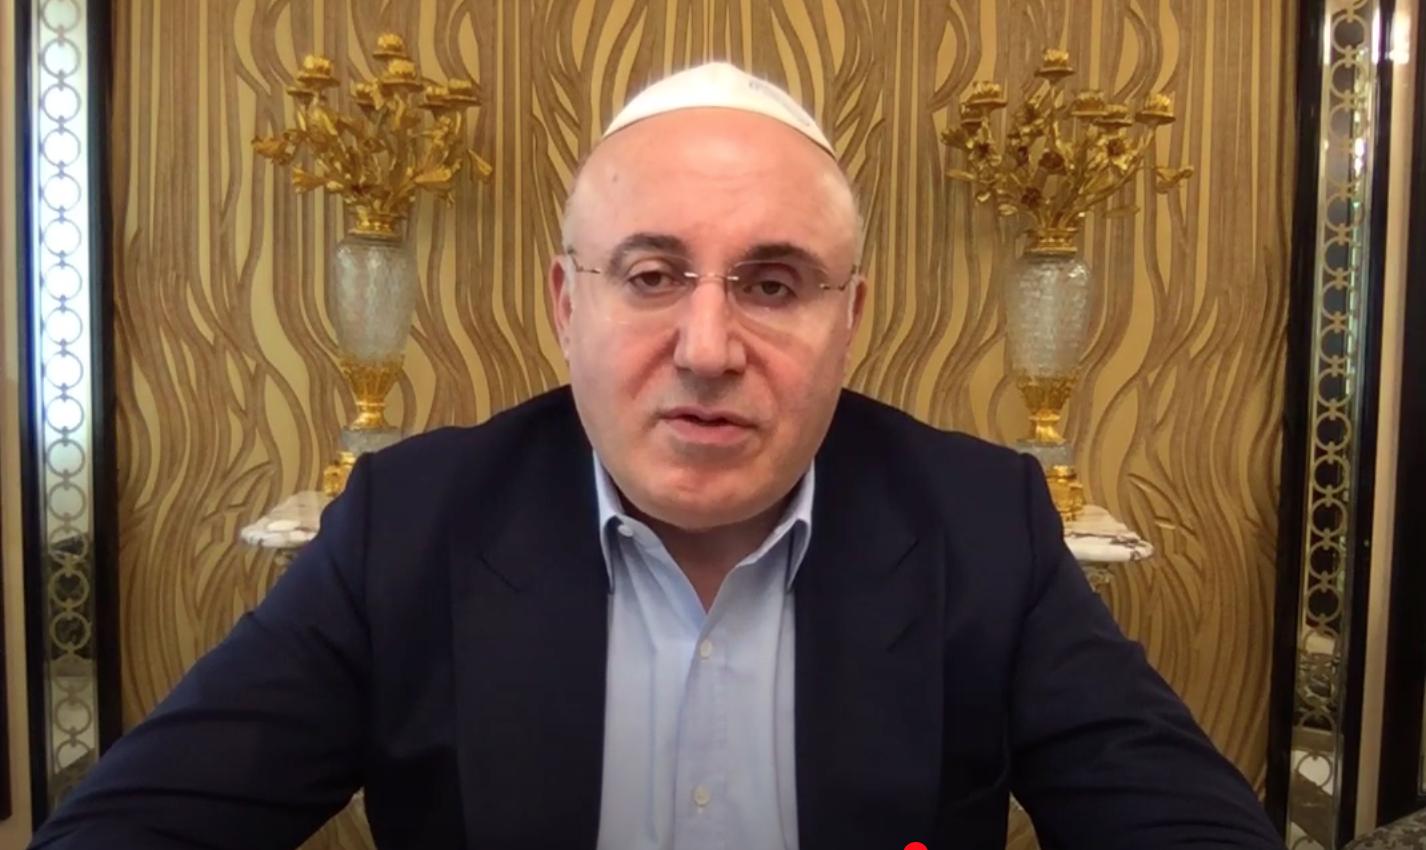 Теймураз Хихинашвили. Кадр из видео YouTube / Russian Jewish Congress